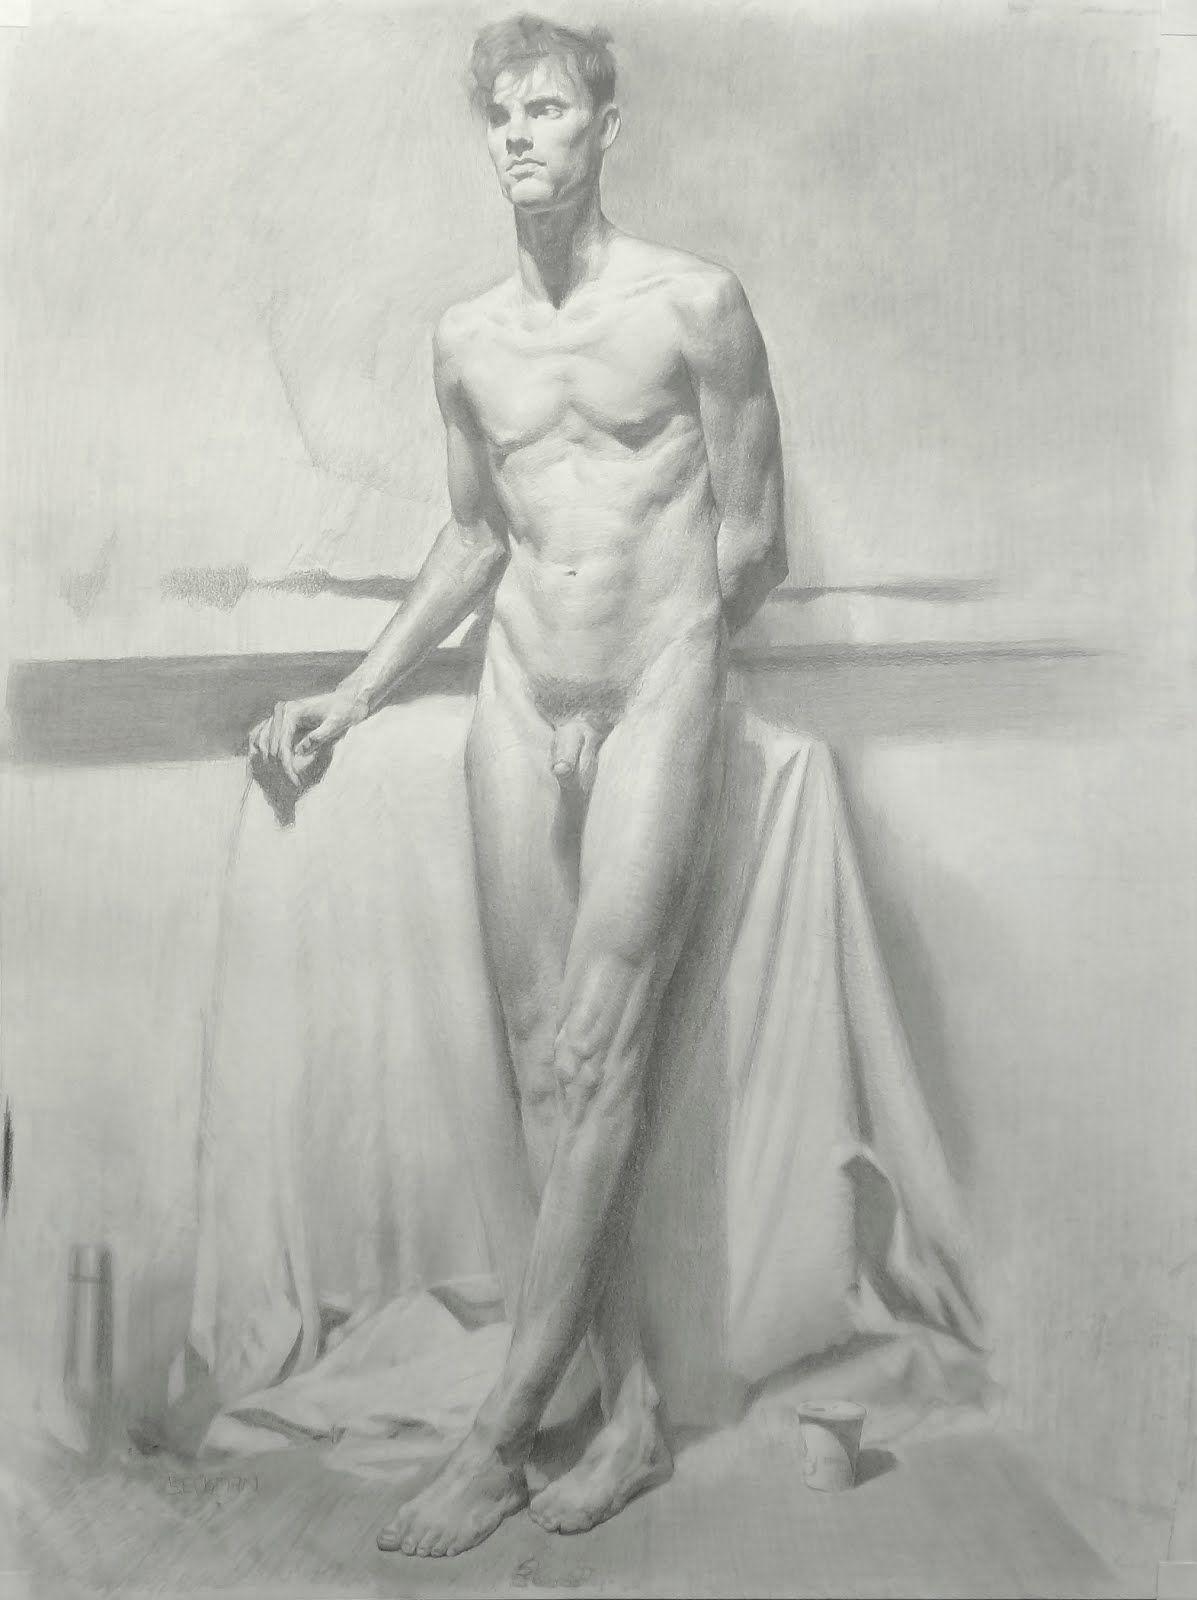 jeffrey mims drawings - Google Search